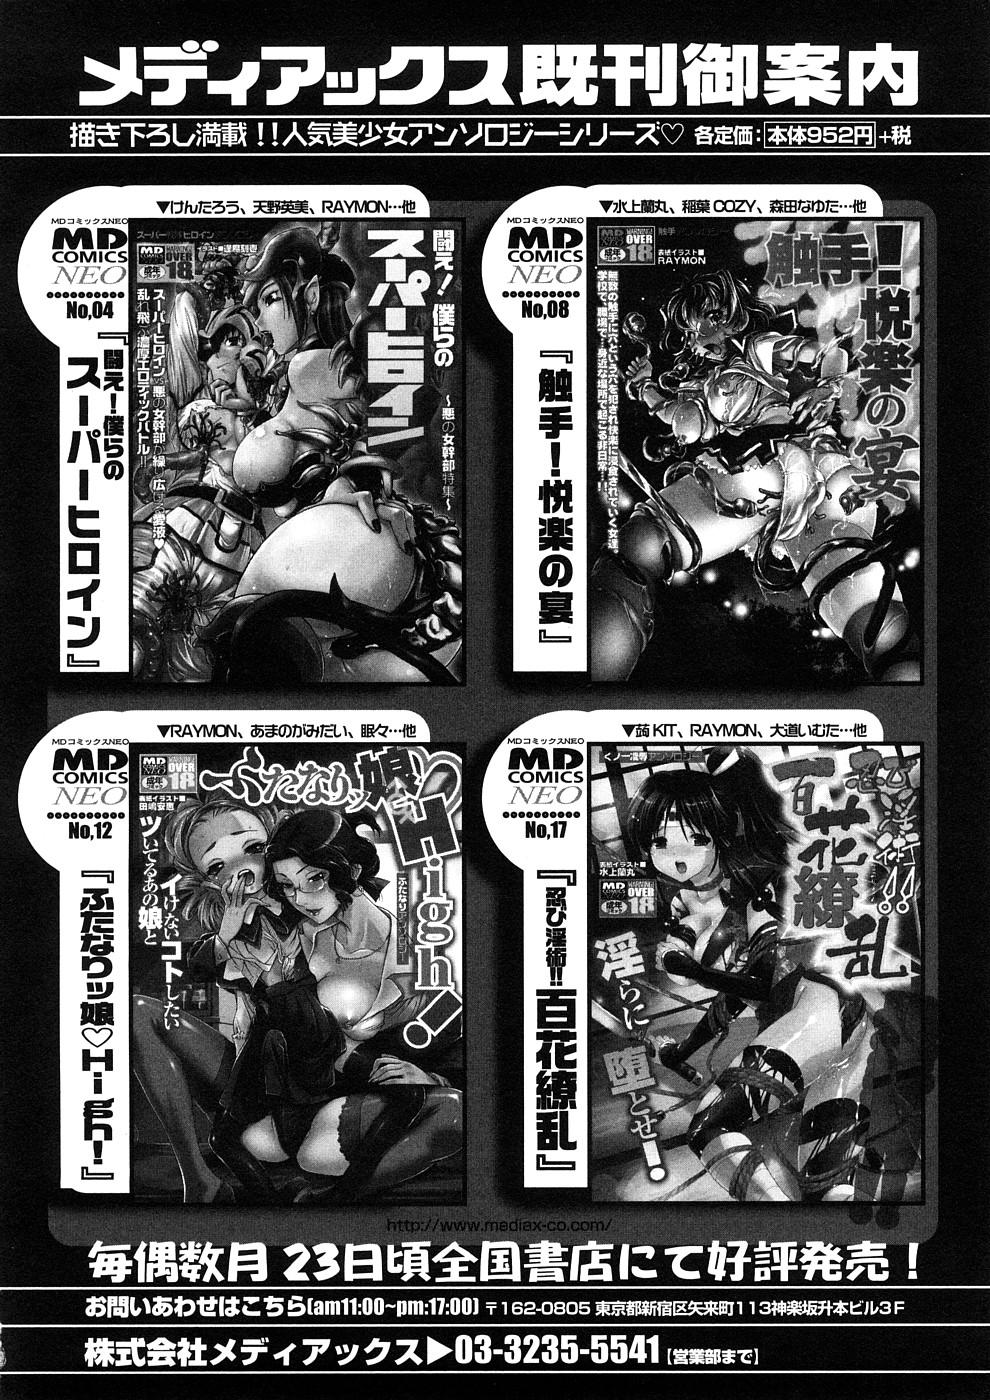 Geki Yaba Anthology Vol. 1 - Naka ni Dashite yo 238